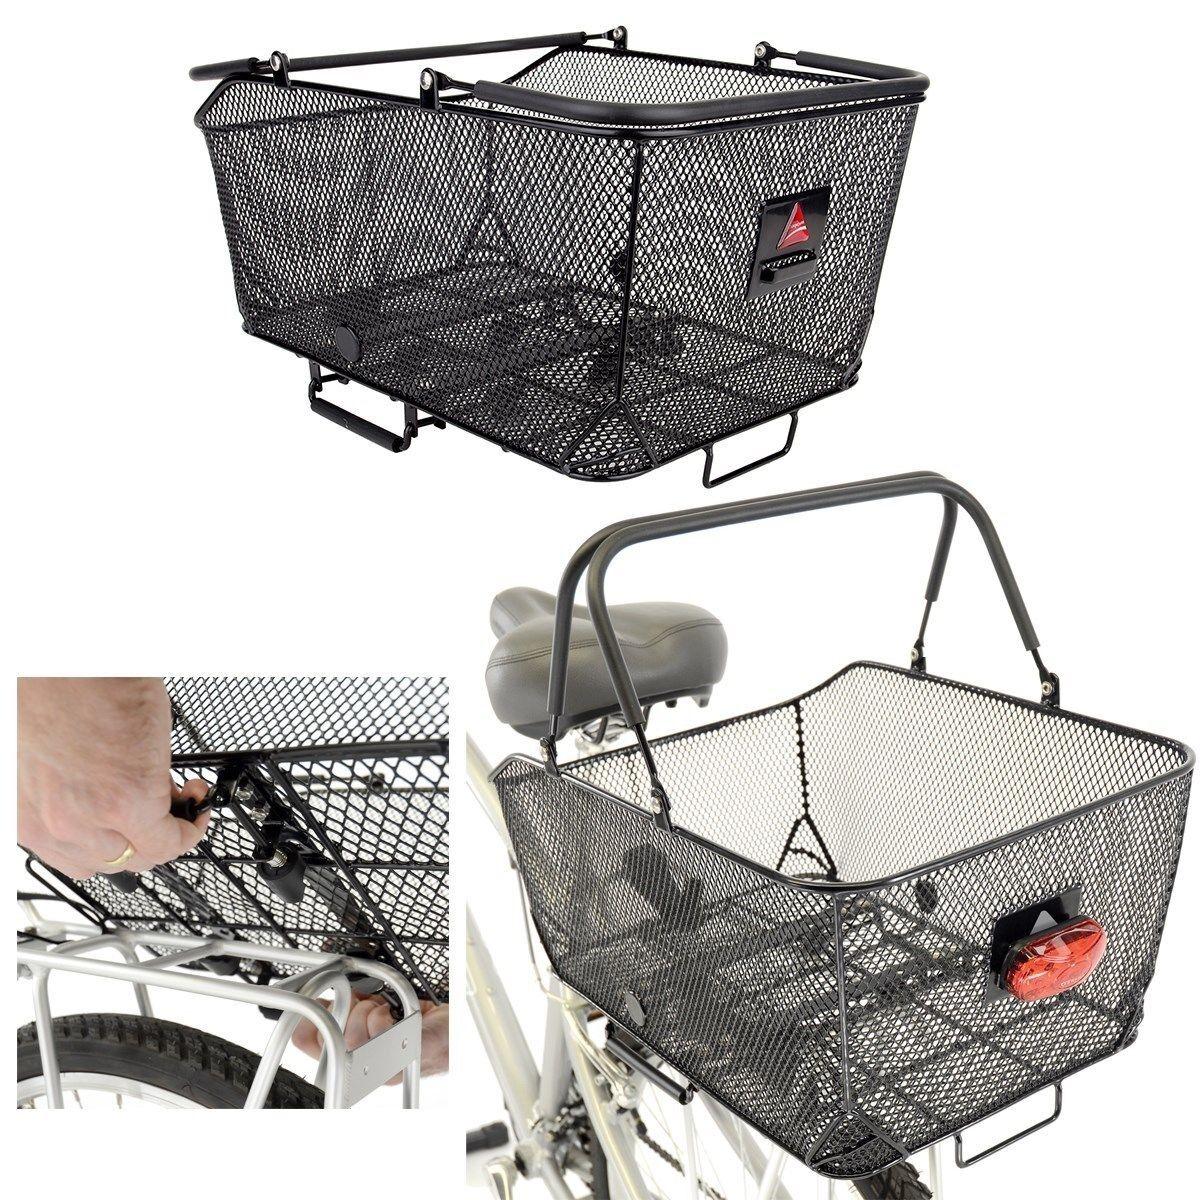 Axiom Mercado Cesta lx-17.7 x12.2 x9,84   - negro-rear-bicycle basket-new